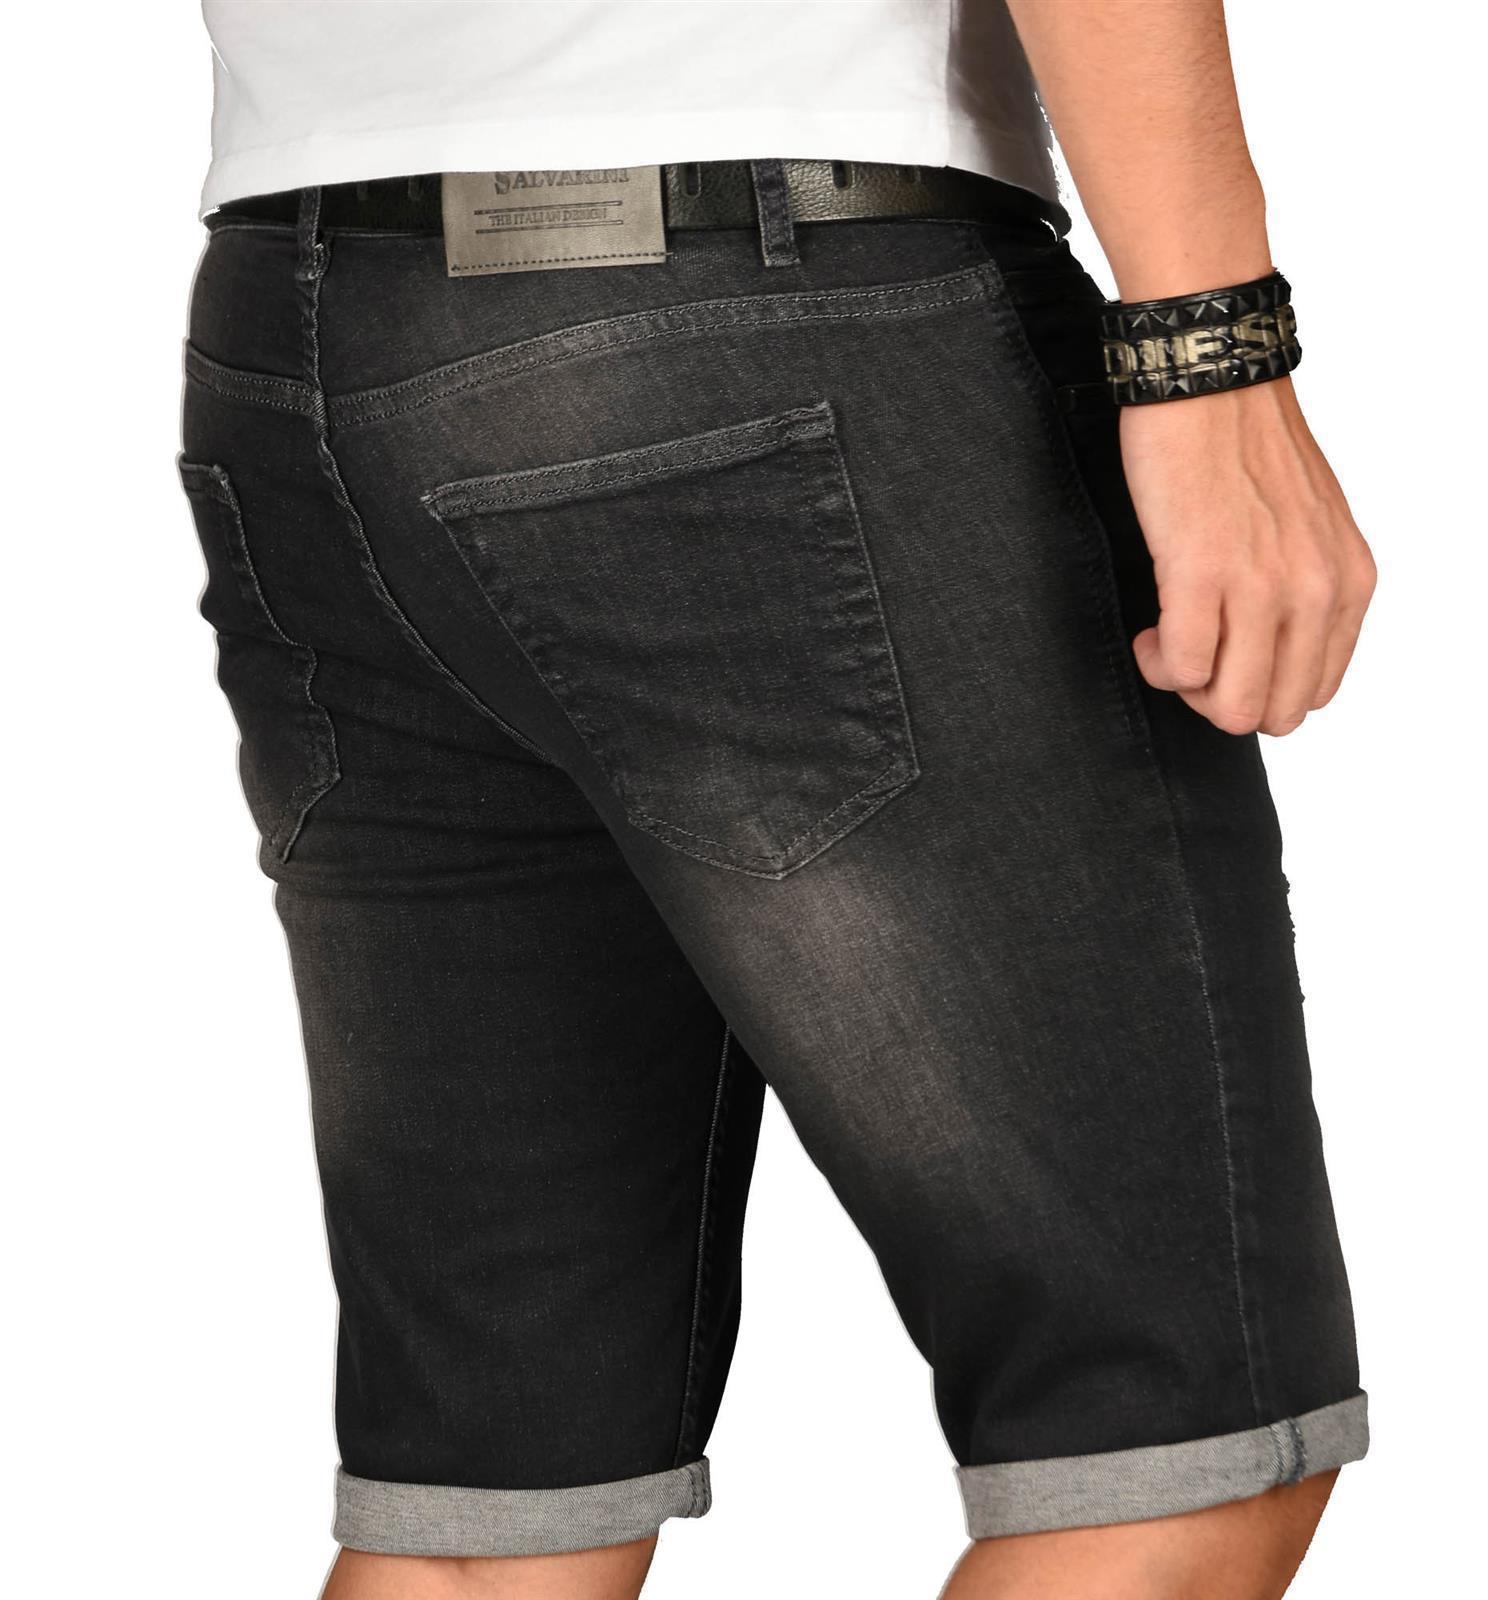 A-Salvarini-Herren-Designer-Jeans-Short-kurze-Hose-Slim-Sommer-Shorts-Washed Indexbild 48